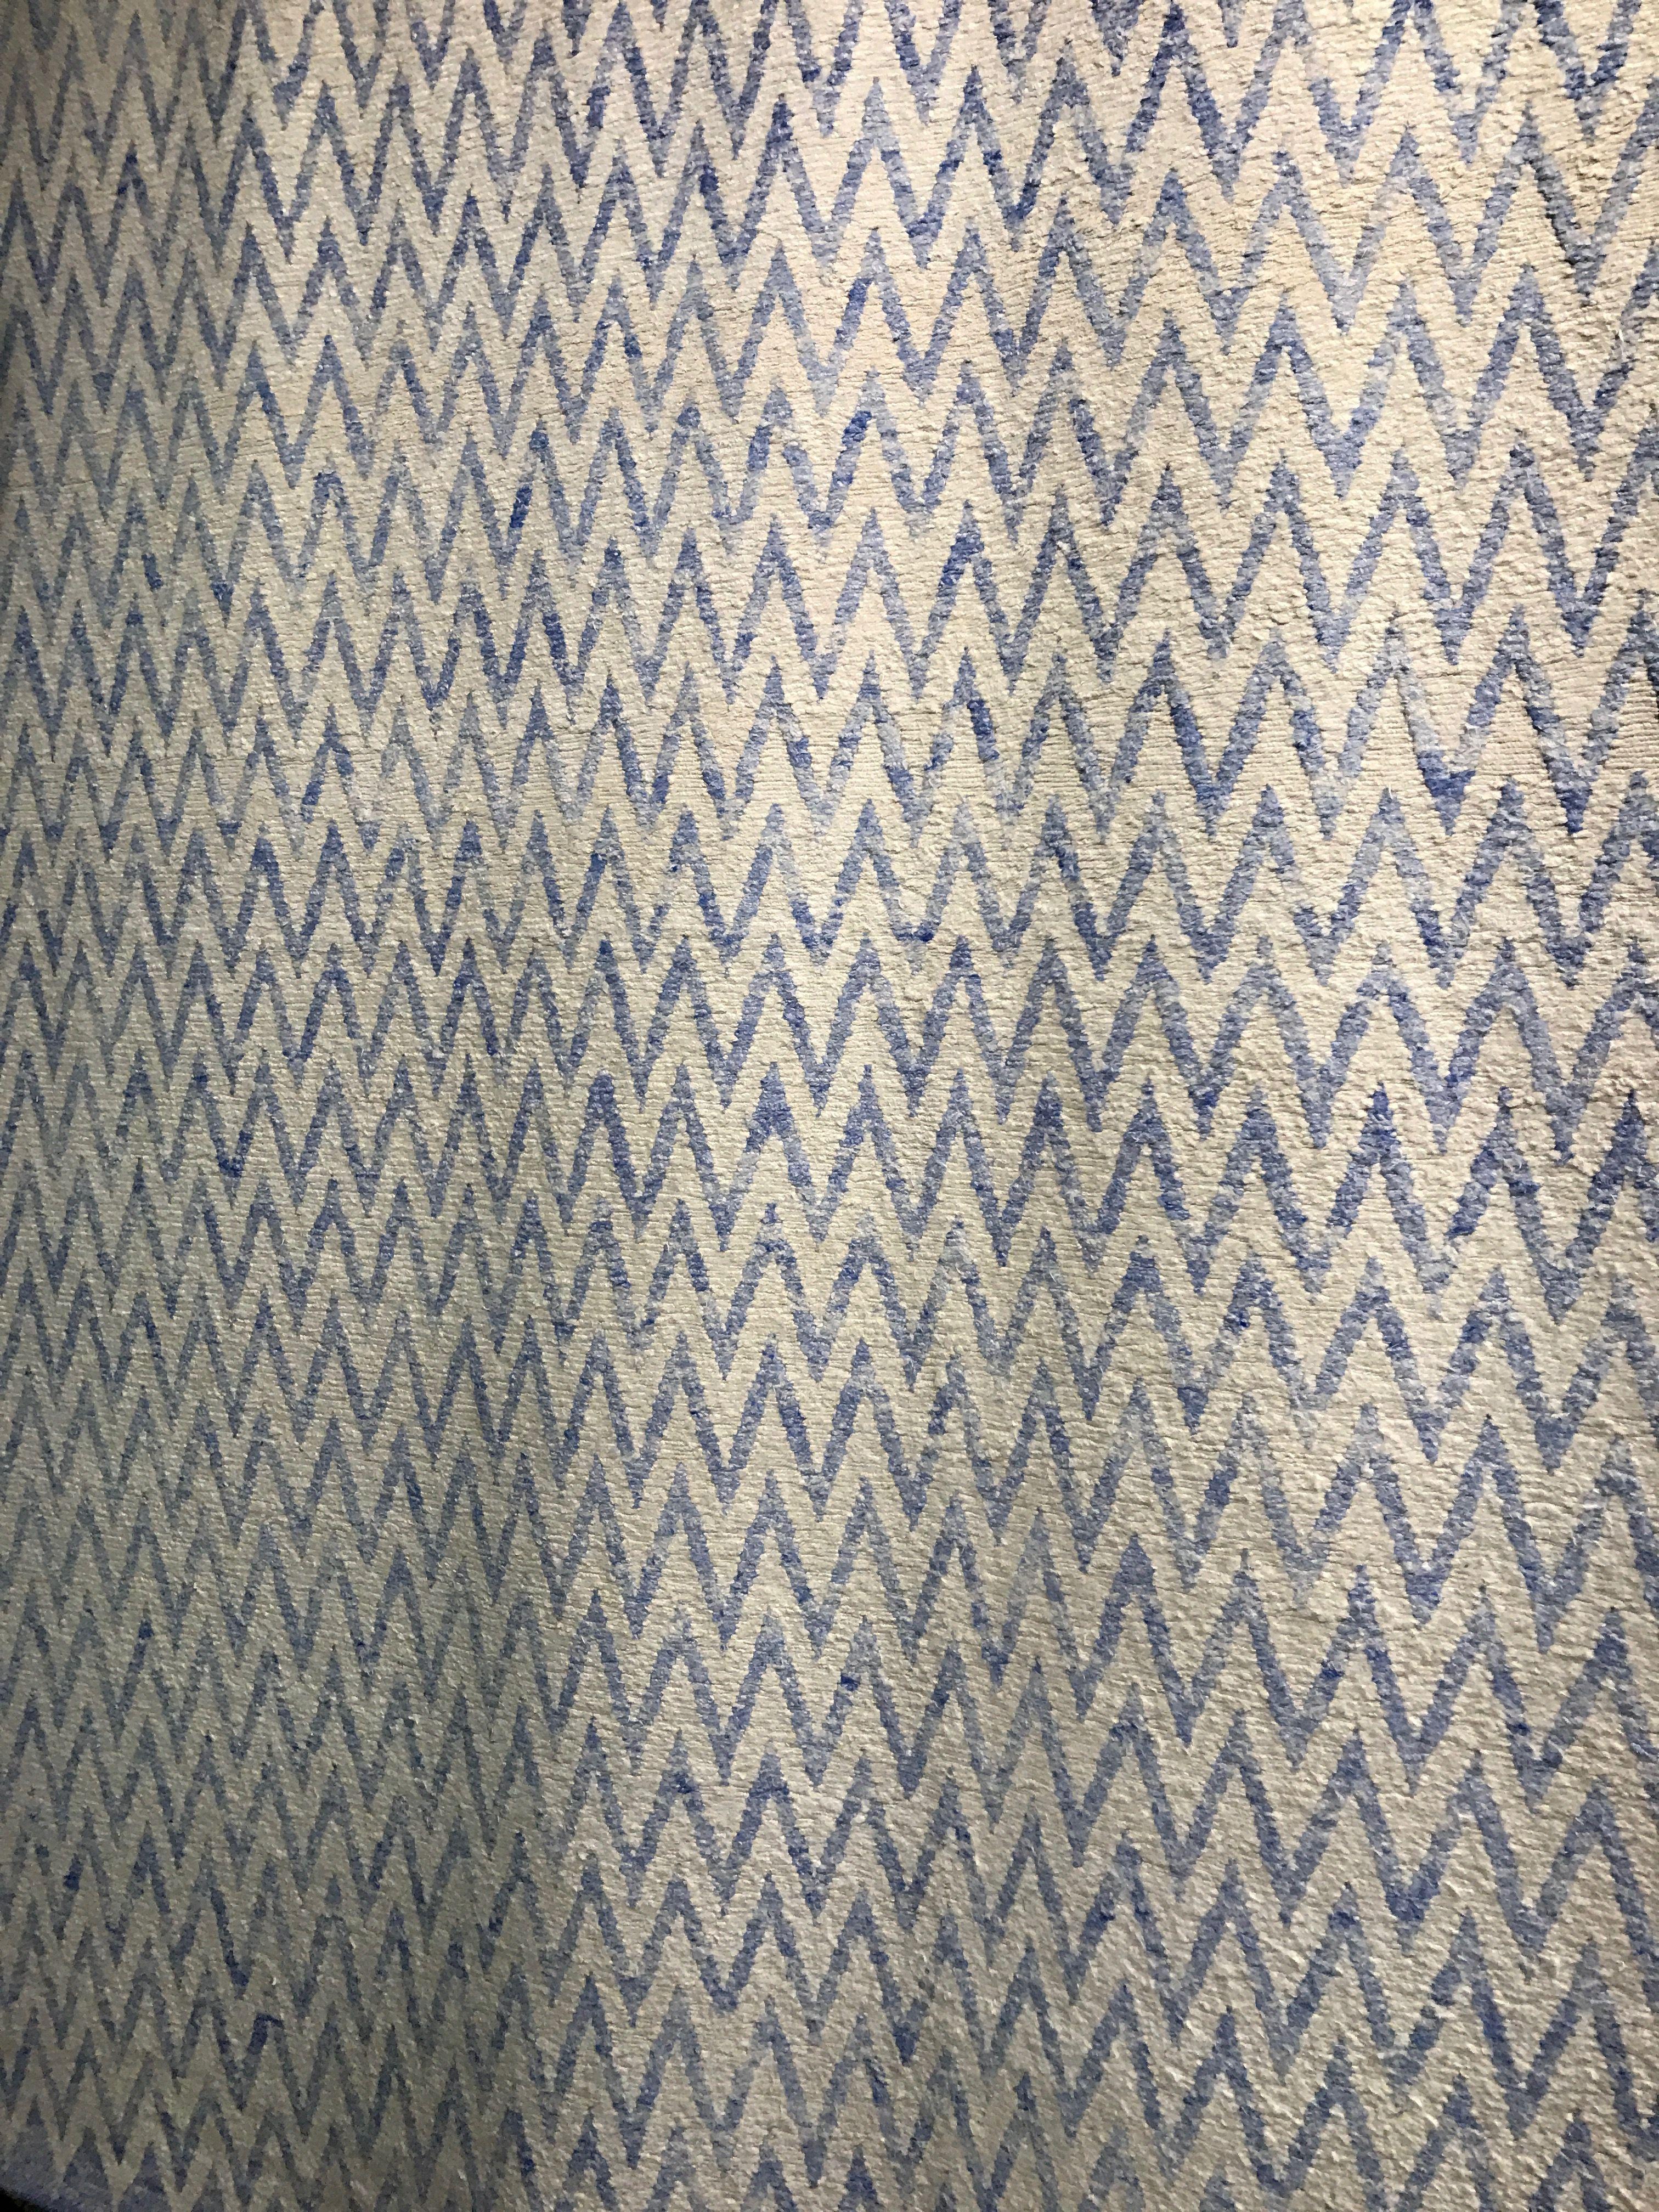 Greenfront rug 6x9 amit indian viscose bluesee 42900